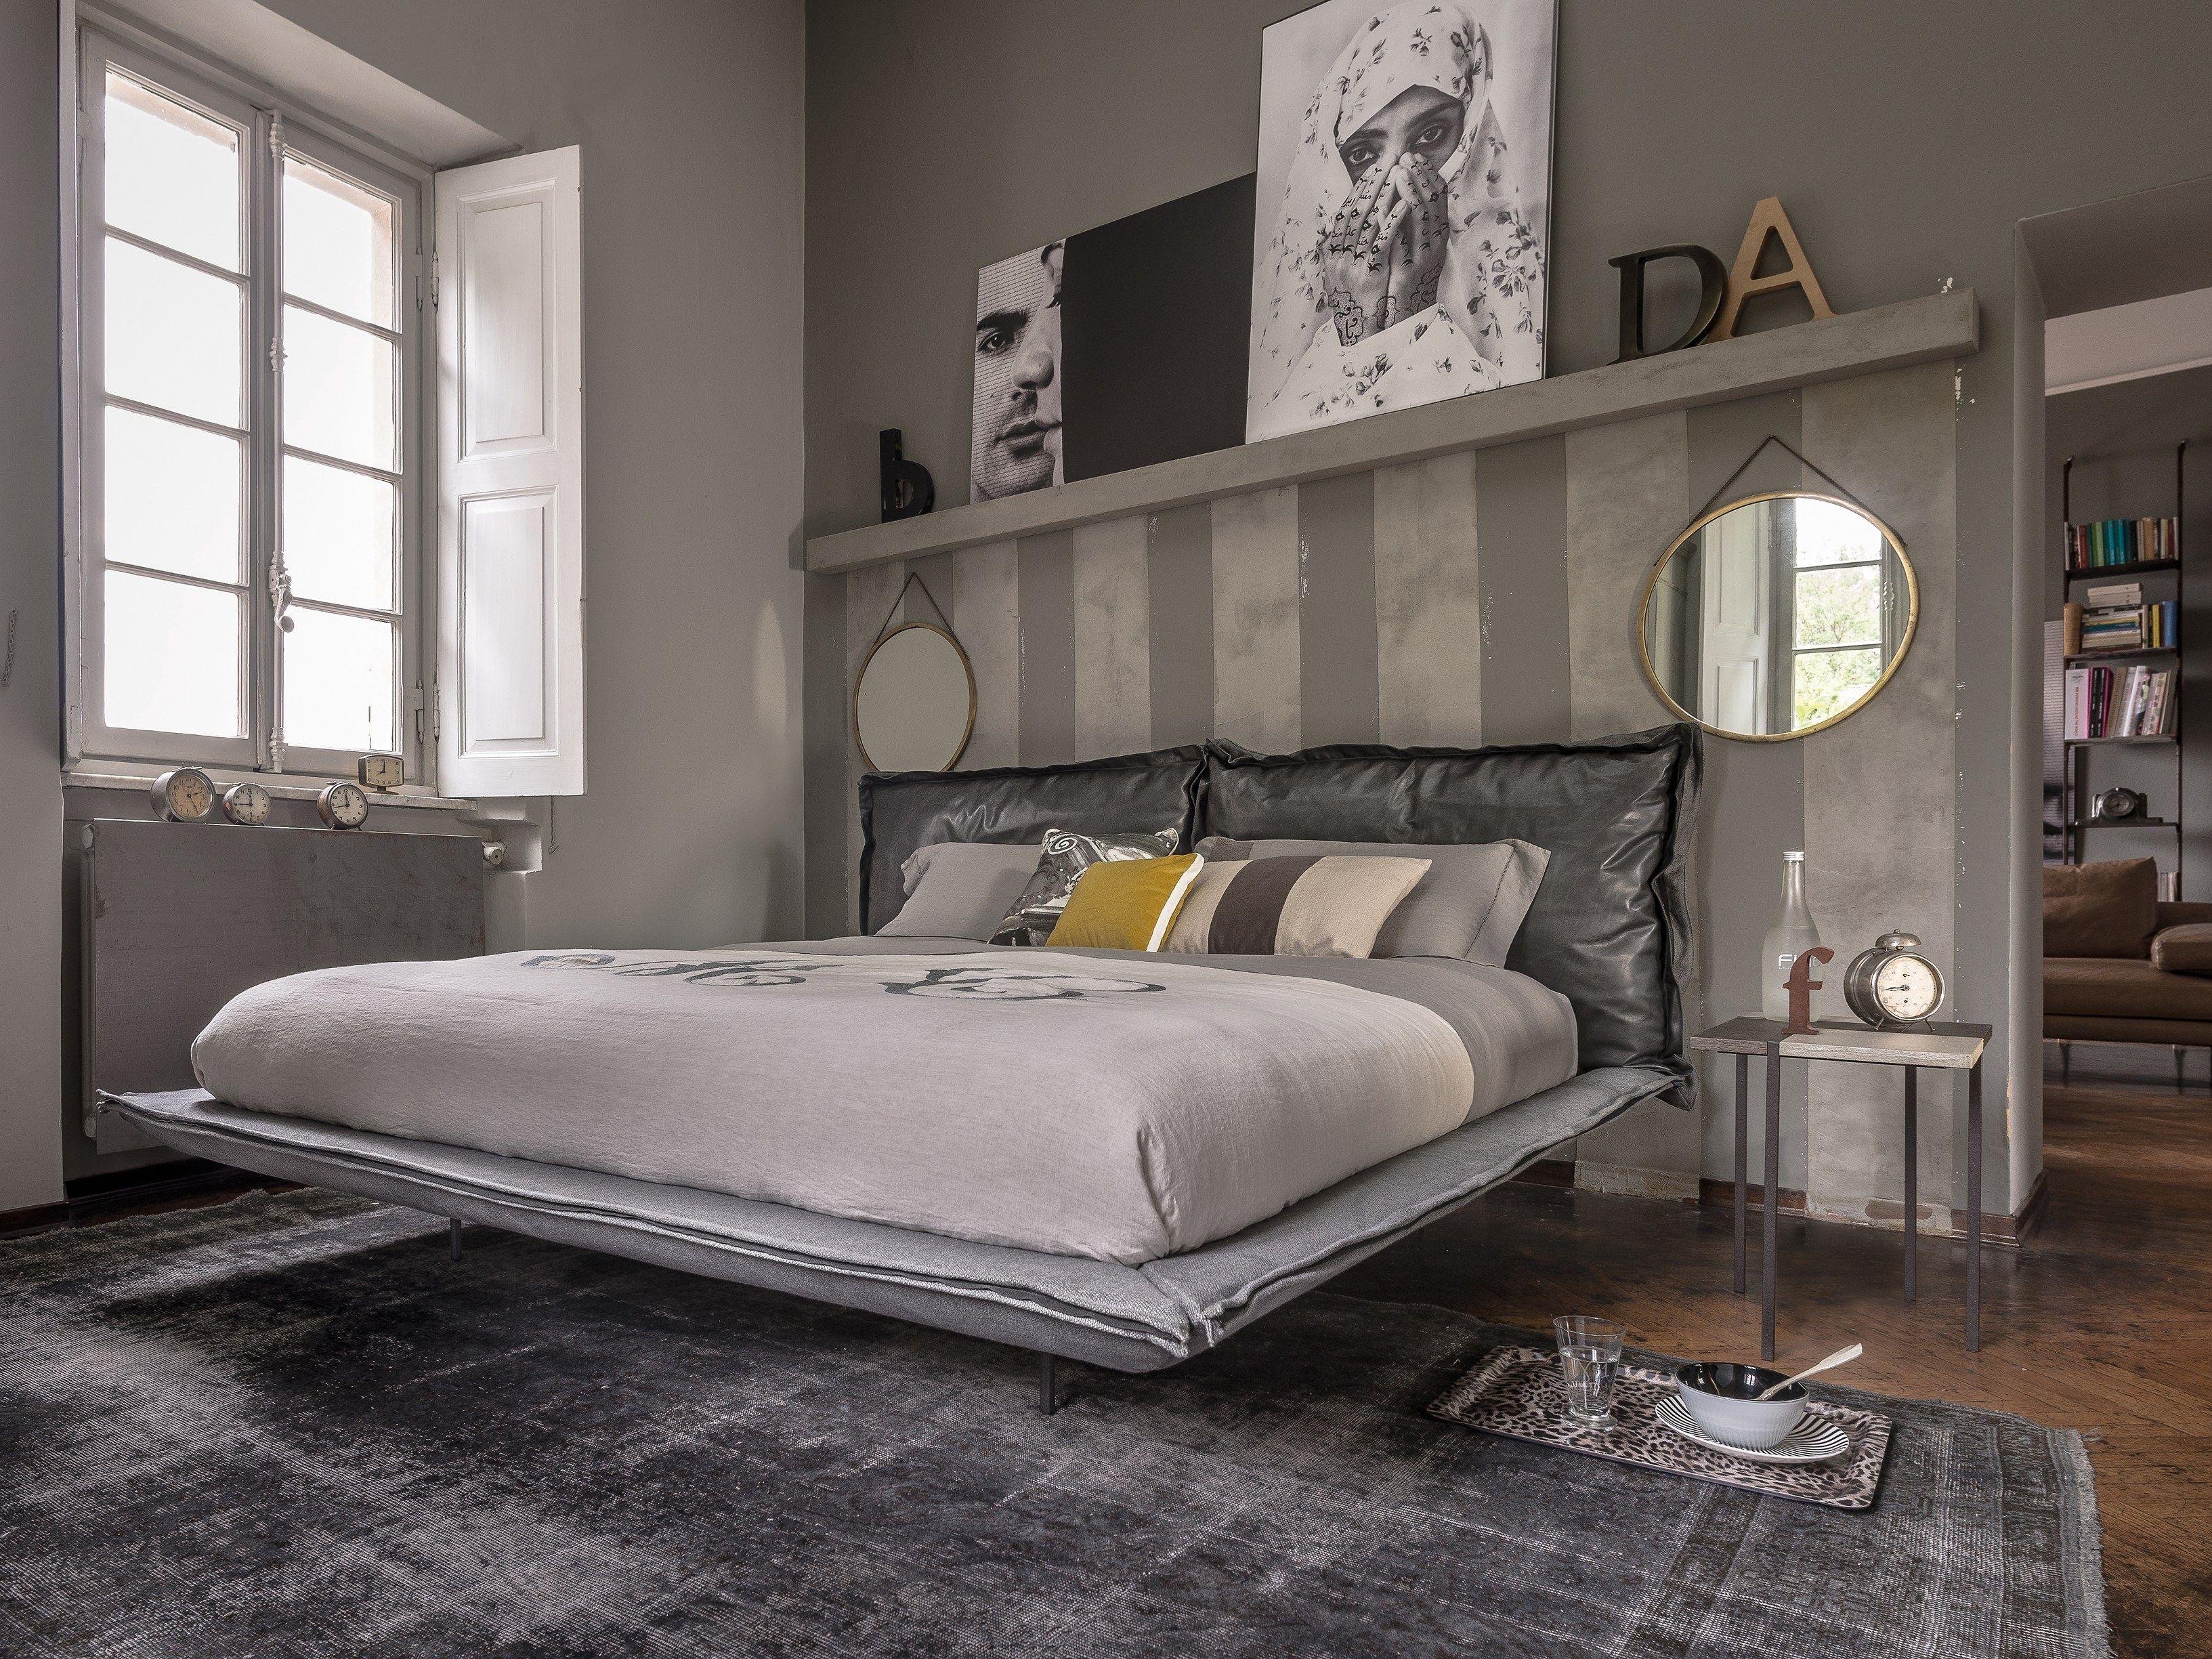 Double bed with upholstered headboard auto reverse dream for Camera da letto uomo